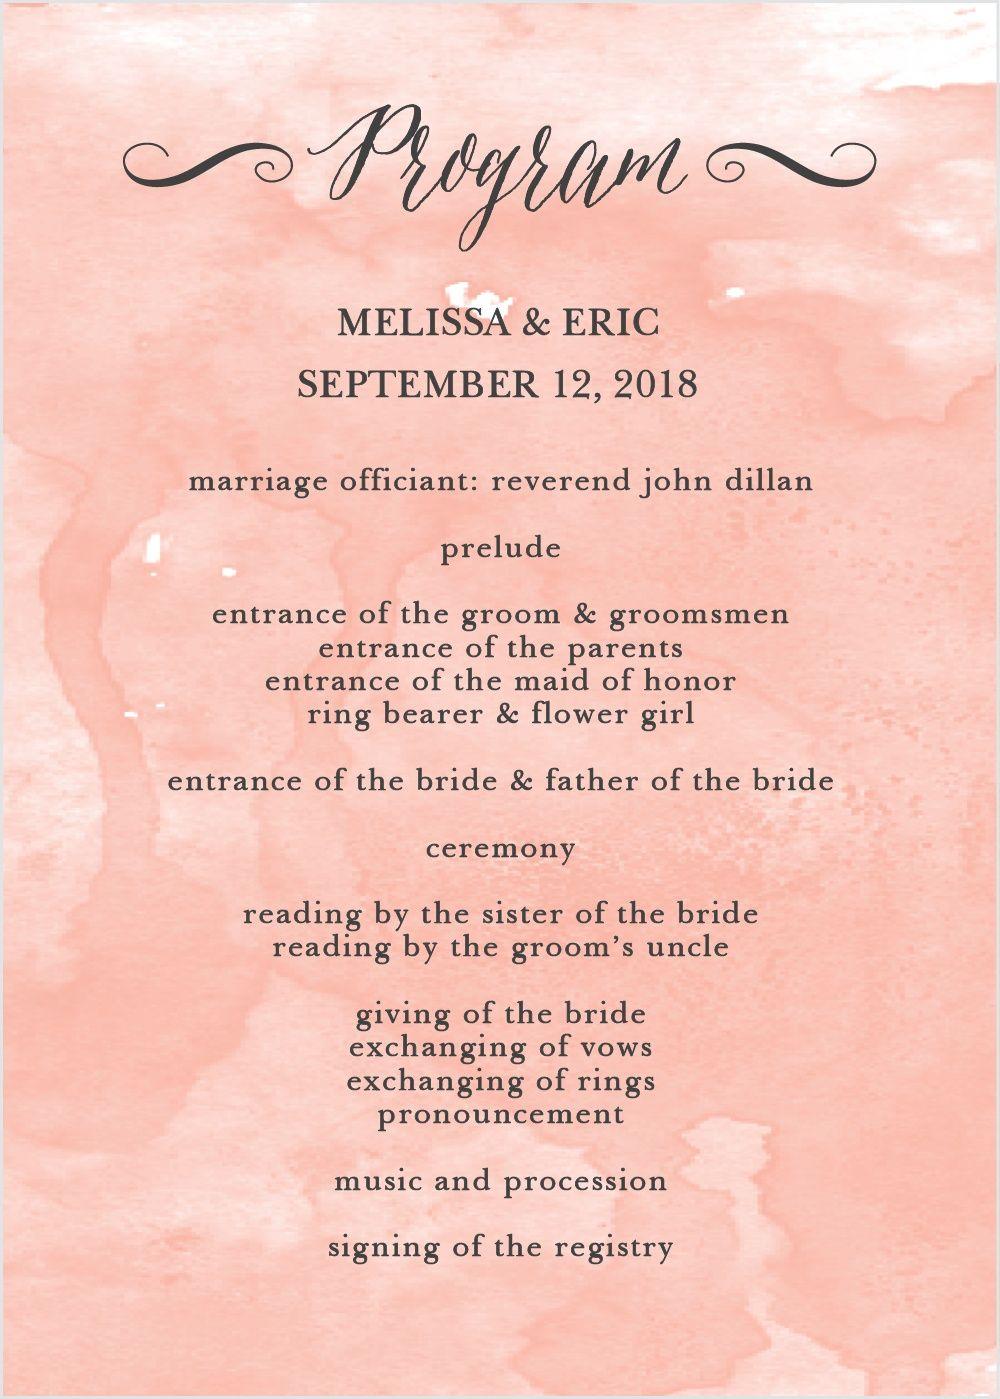 Watercolor Script Wedding Programs -   19 ressional wedding Songs ideas